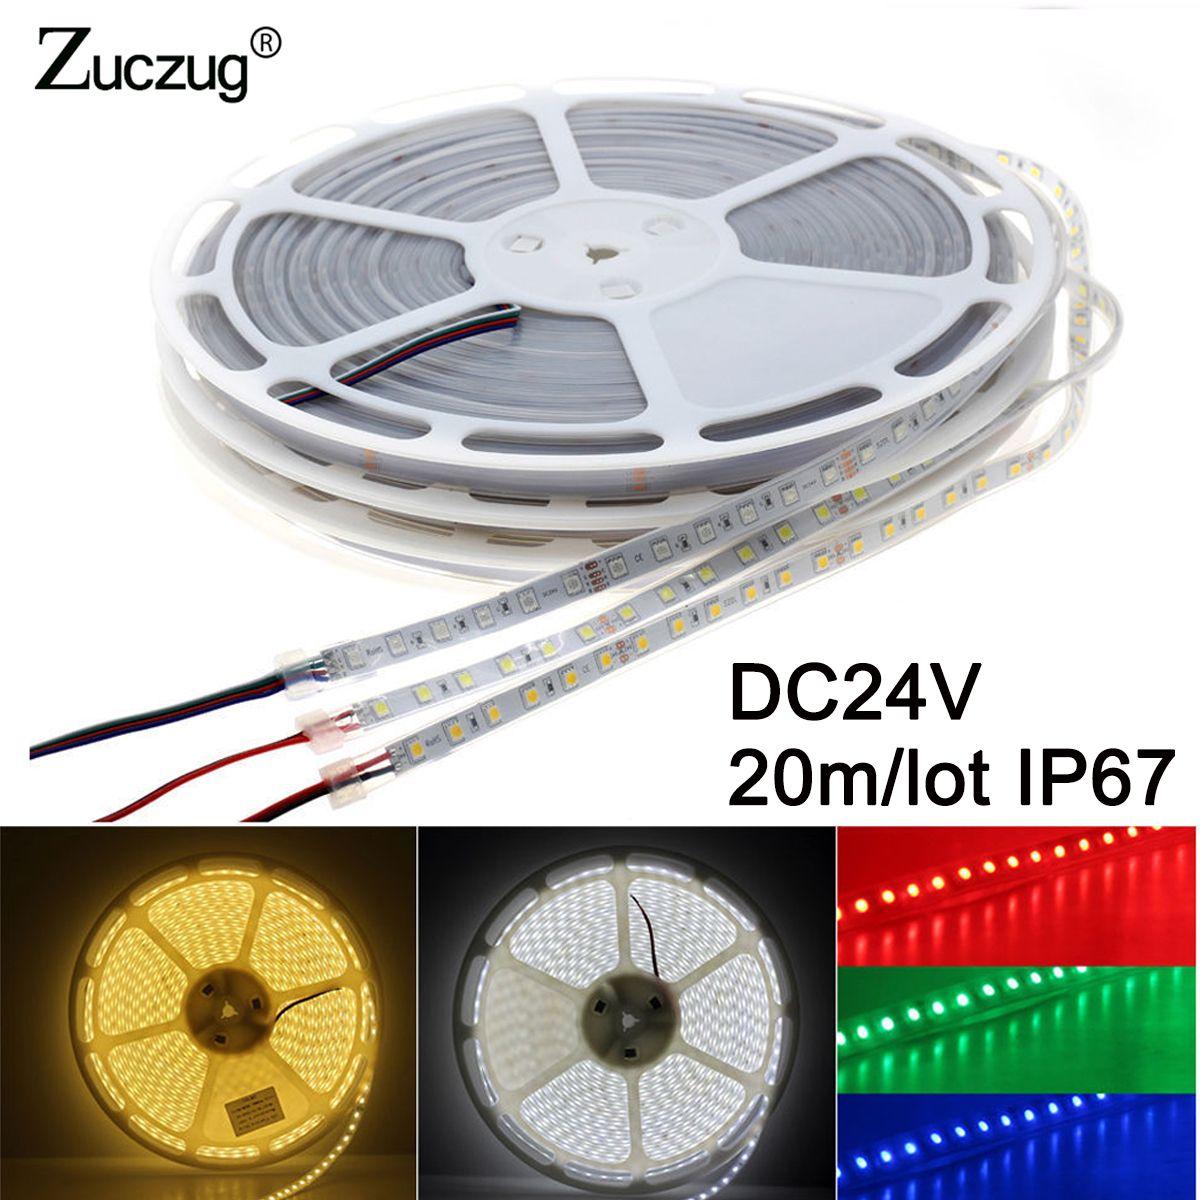 24V 20m led strip light 5050 DC 24 v volt silicon tube waterproof IP67 1200led cool white warm white rgb flexible tape ledstrip